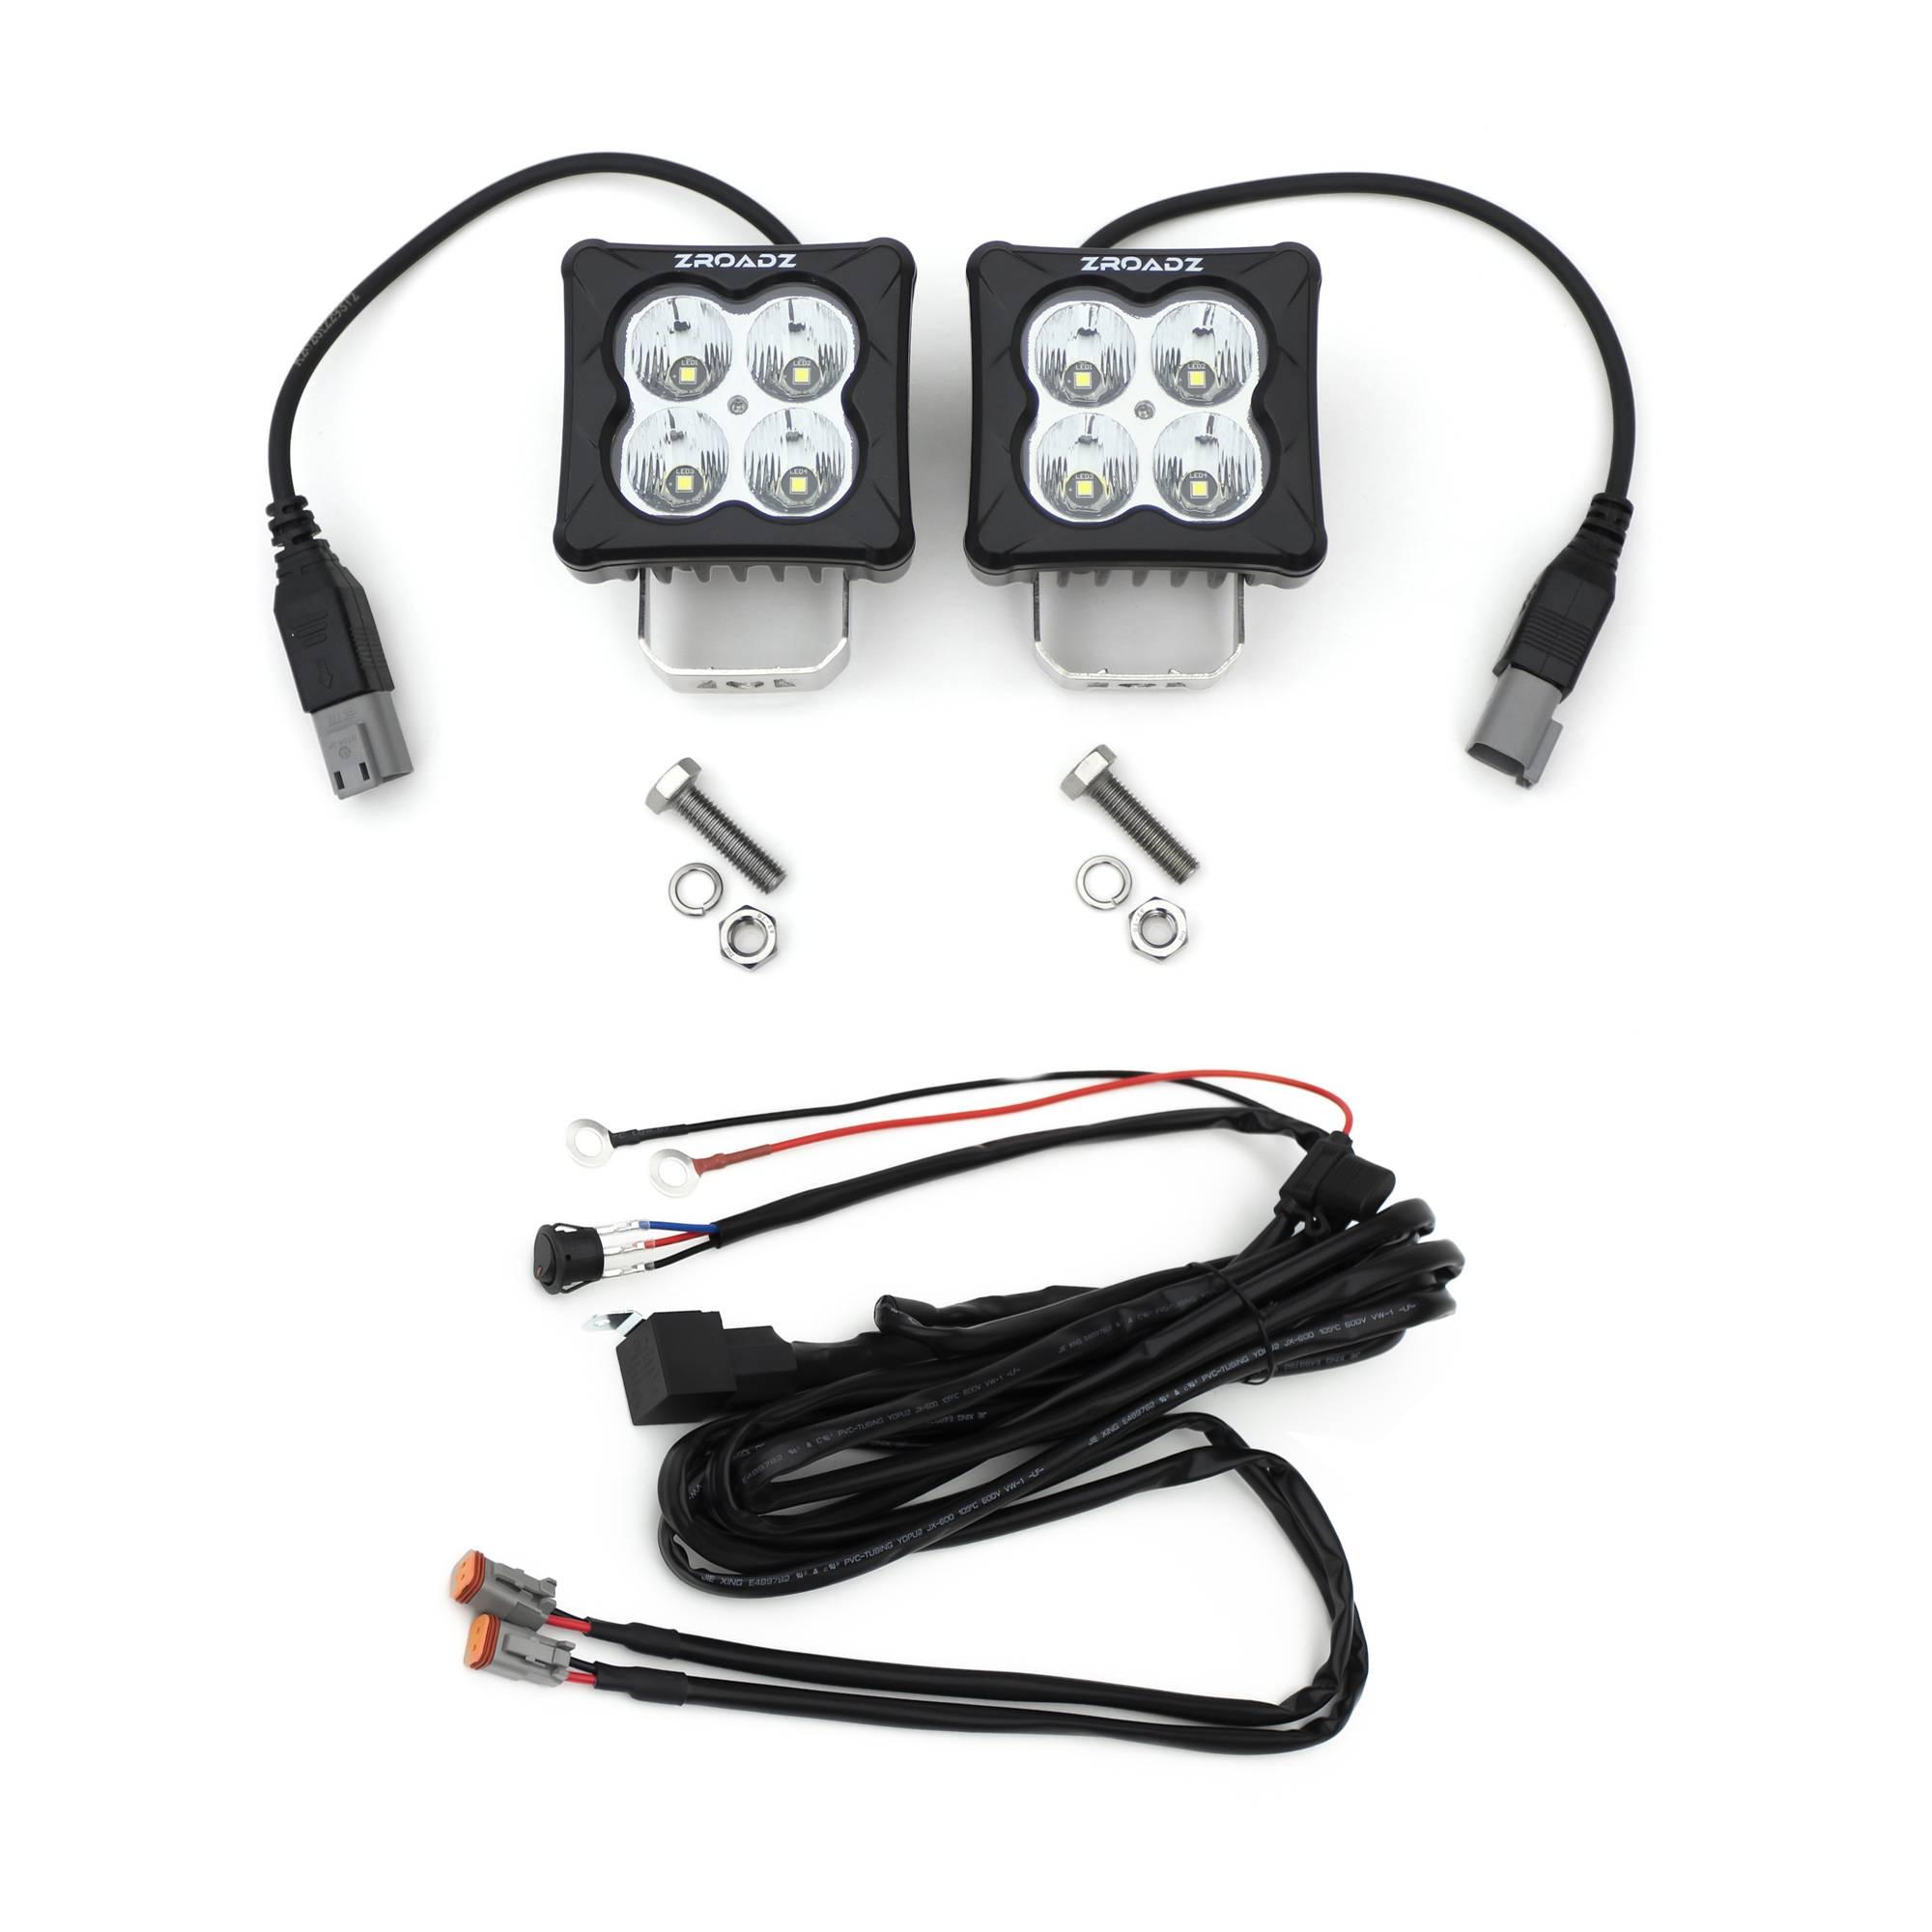 ZROADZ OFF ROAD PRODUCTS - 3 inch ZROADZ LED Light Pod Kit, G2 Series, Bright White, Flood Beam, 2 Piece With Wiring Harness - PN #Z30BC20W-D3F-K